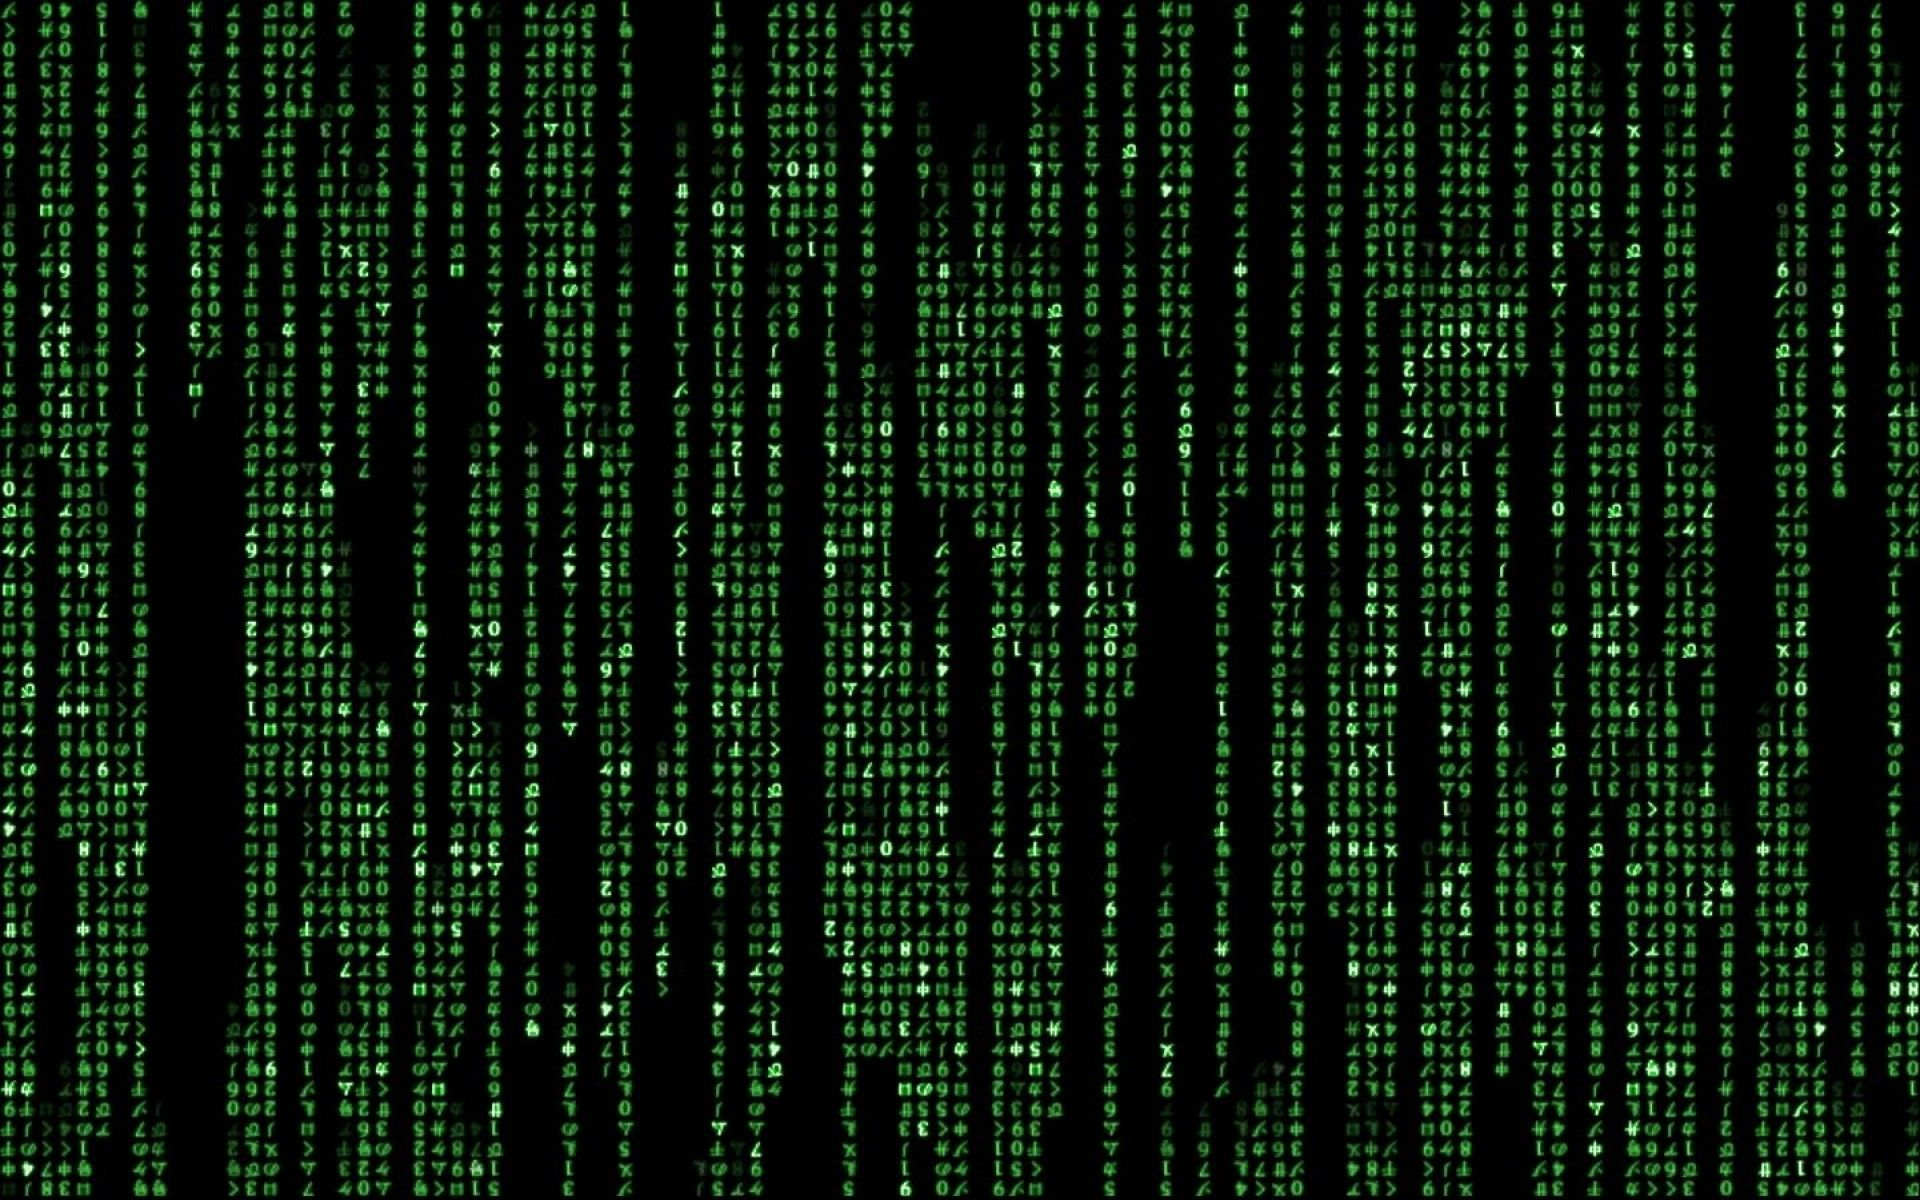 1920x1200 Animated Matrix Wallpaper in 2019.